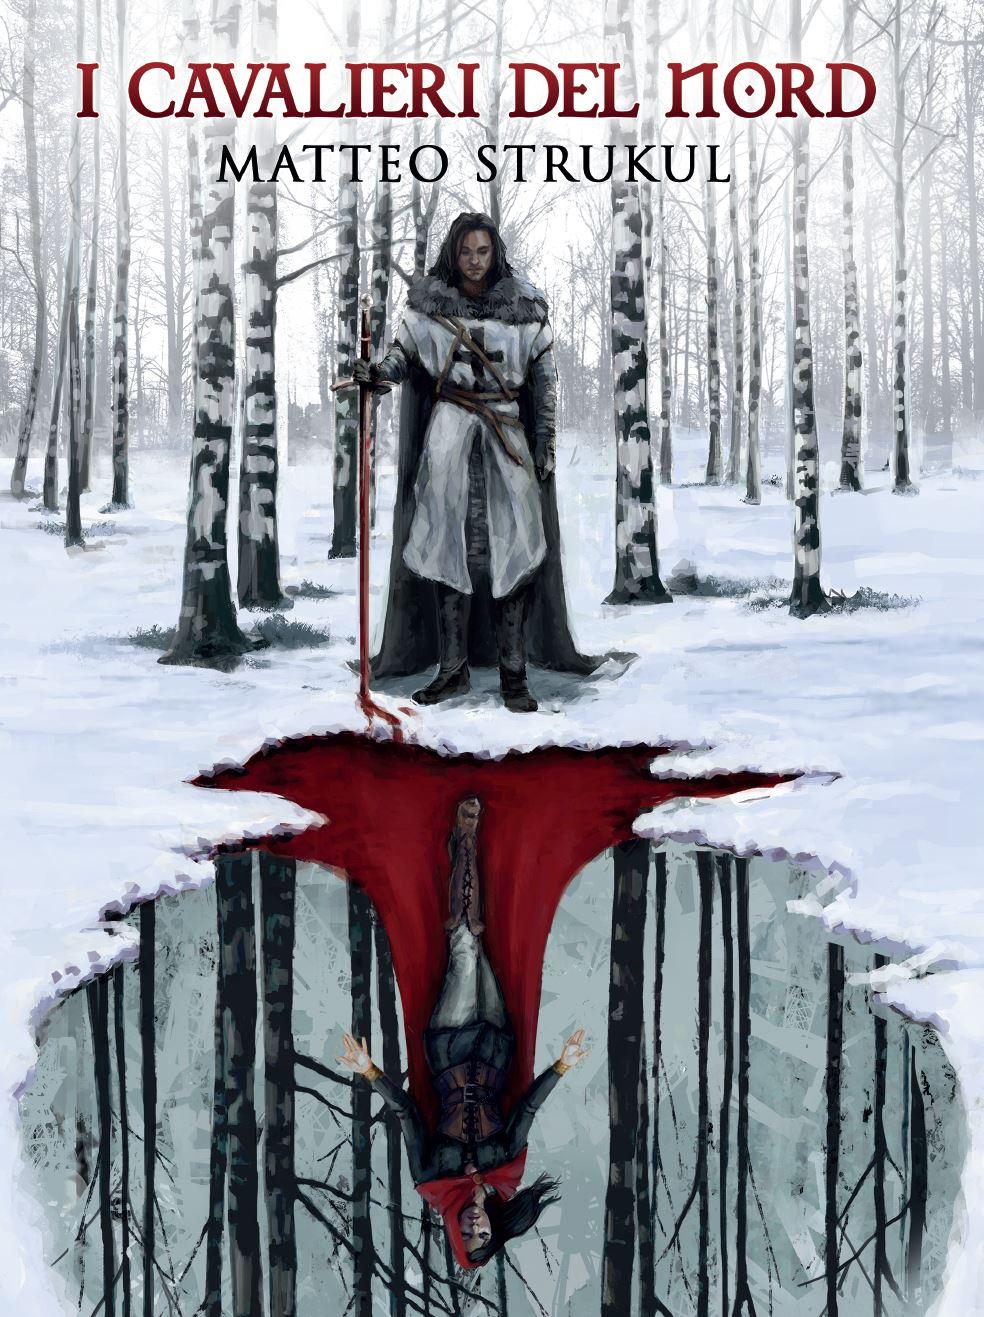 i-cavalieri-del-nord-matteo-strukul-multiplayer-recensione